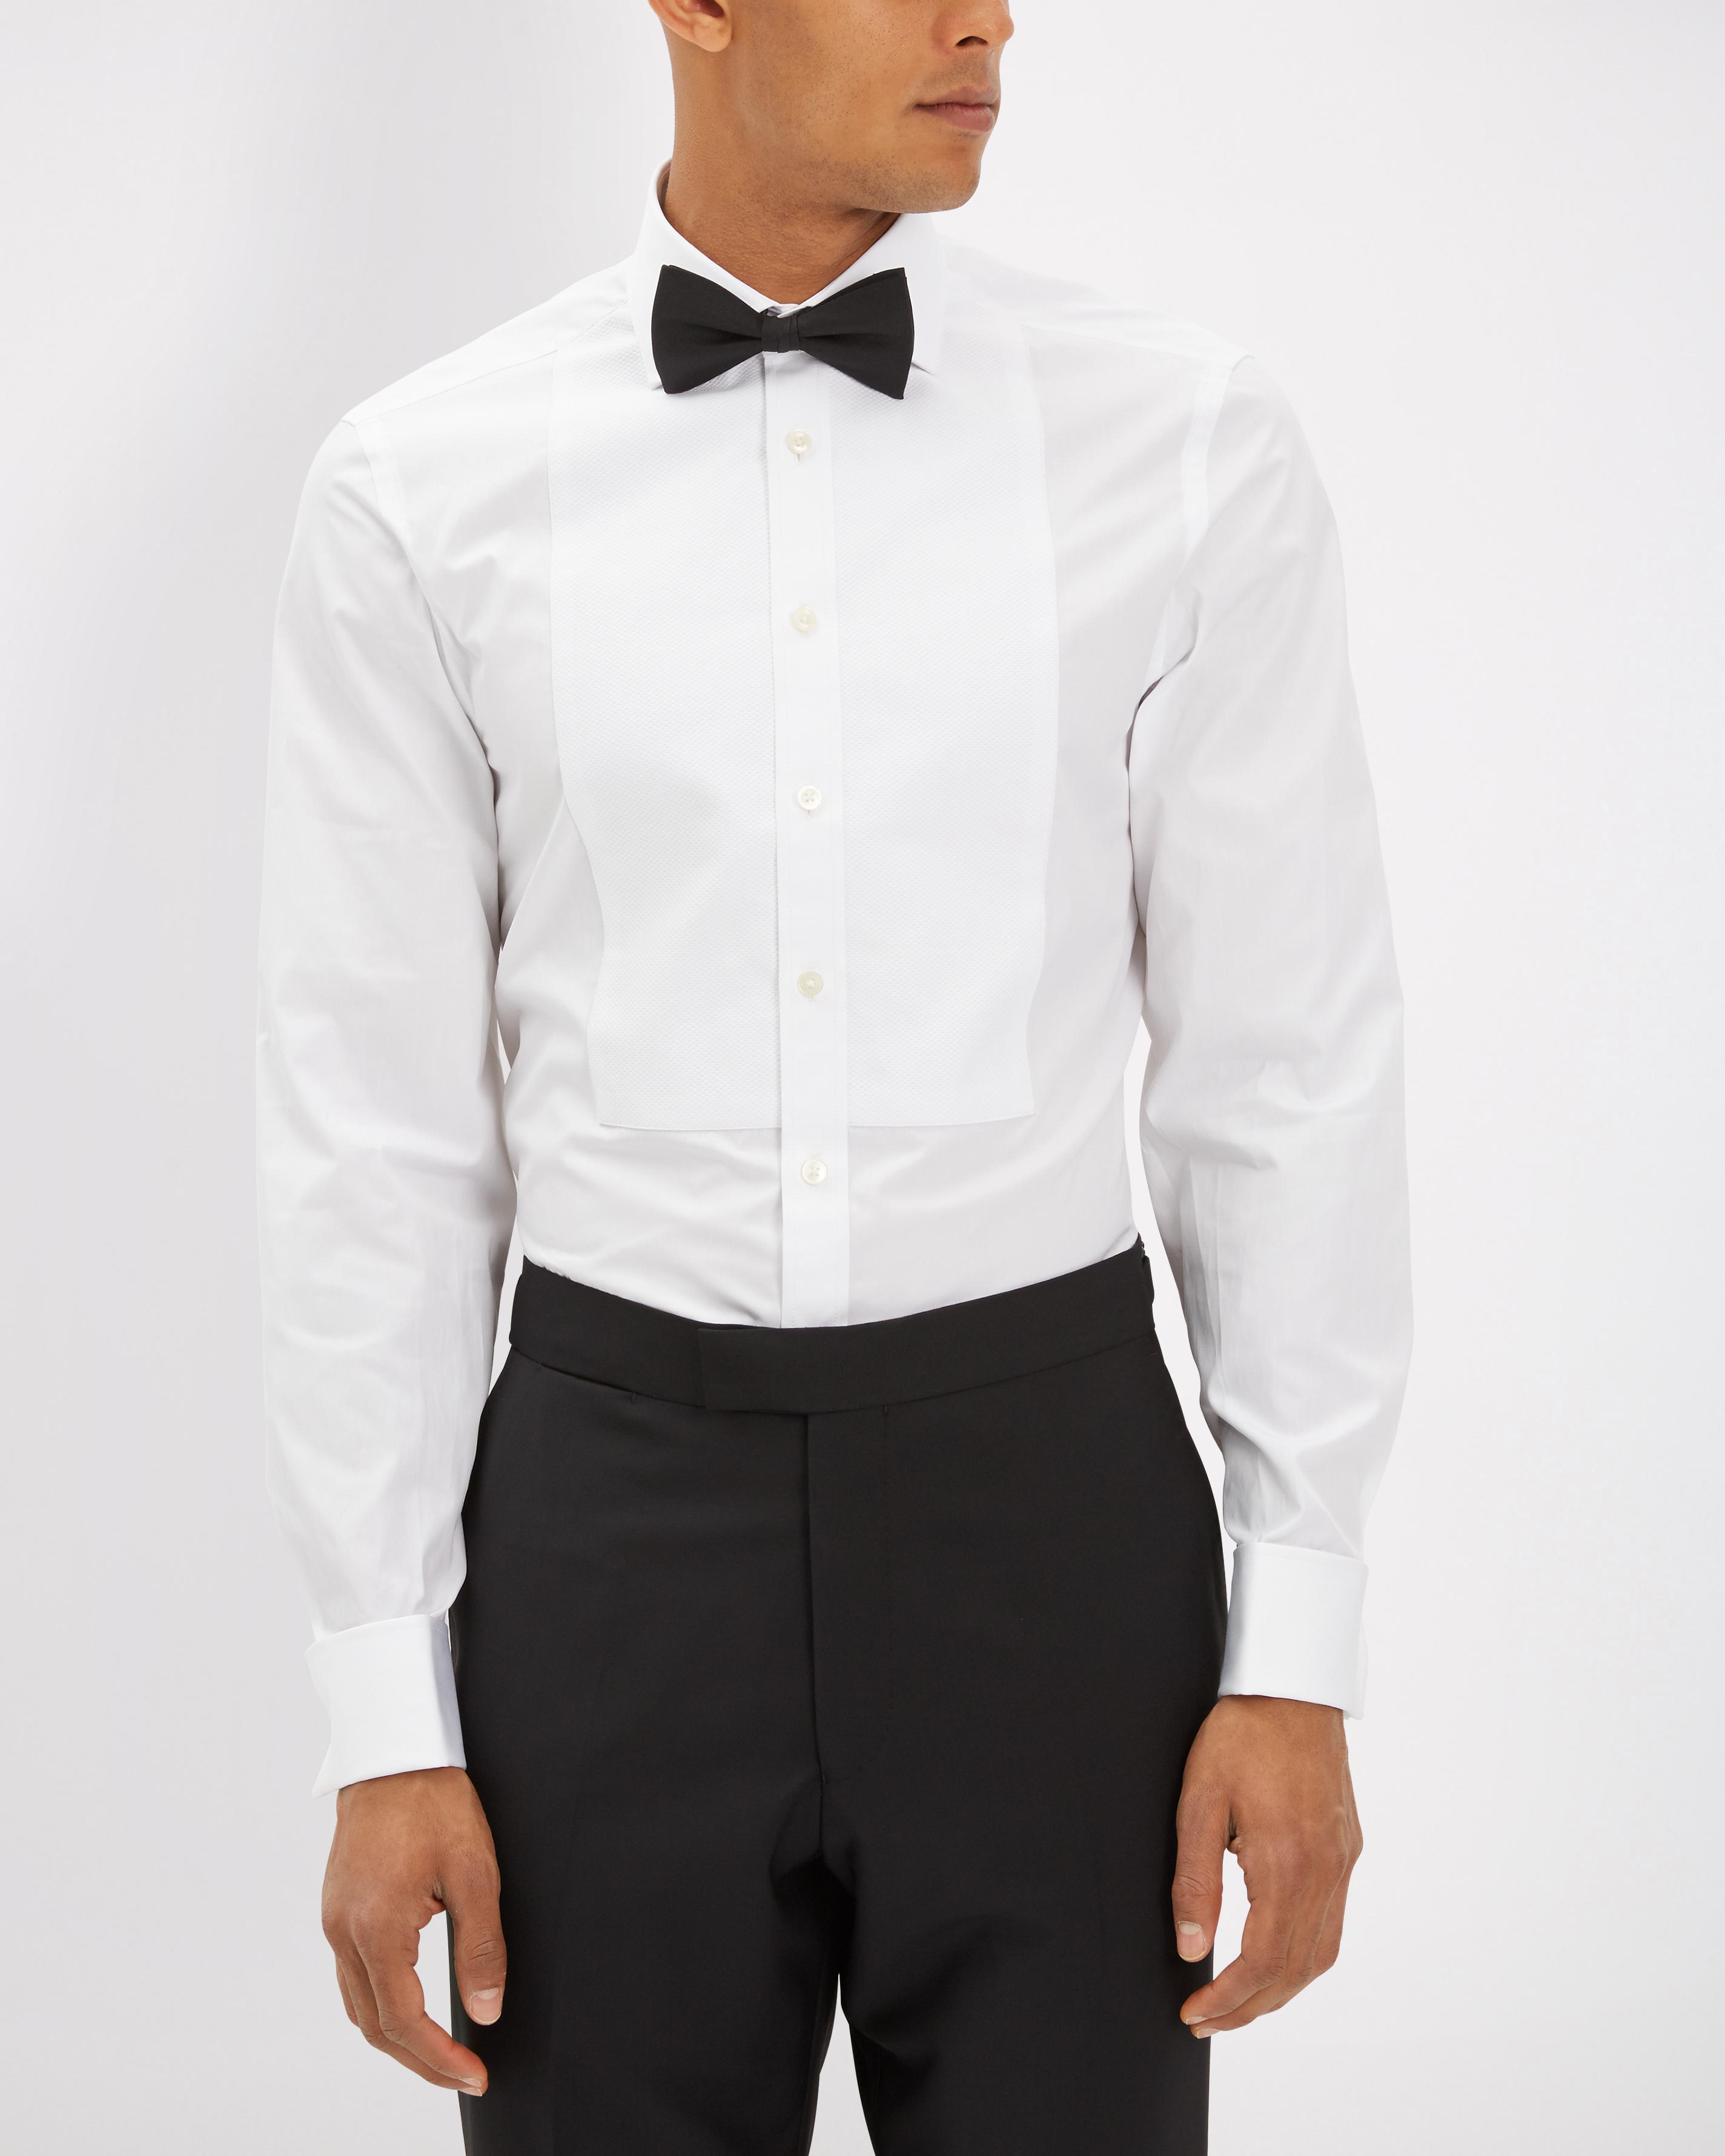 1a187467739 Jaeger Marcella Bib Slim Fit Dress Shirt in White for Men - Lyst